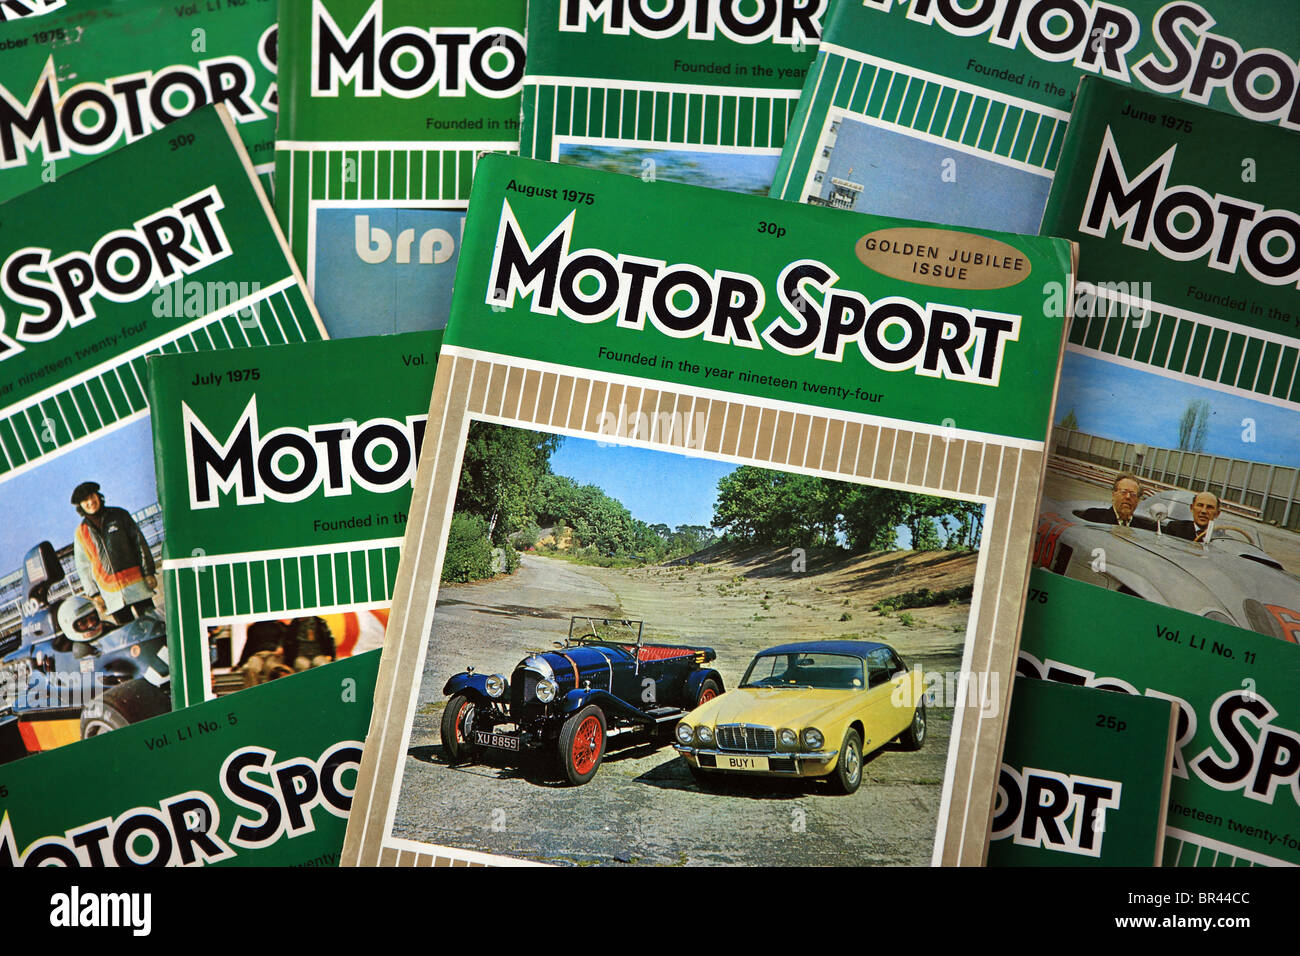 Motor Sport revistas desde 1975 Imagen De Stock